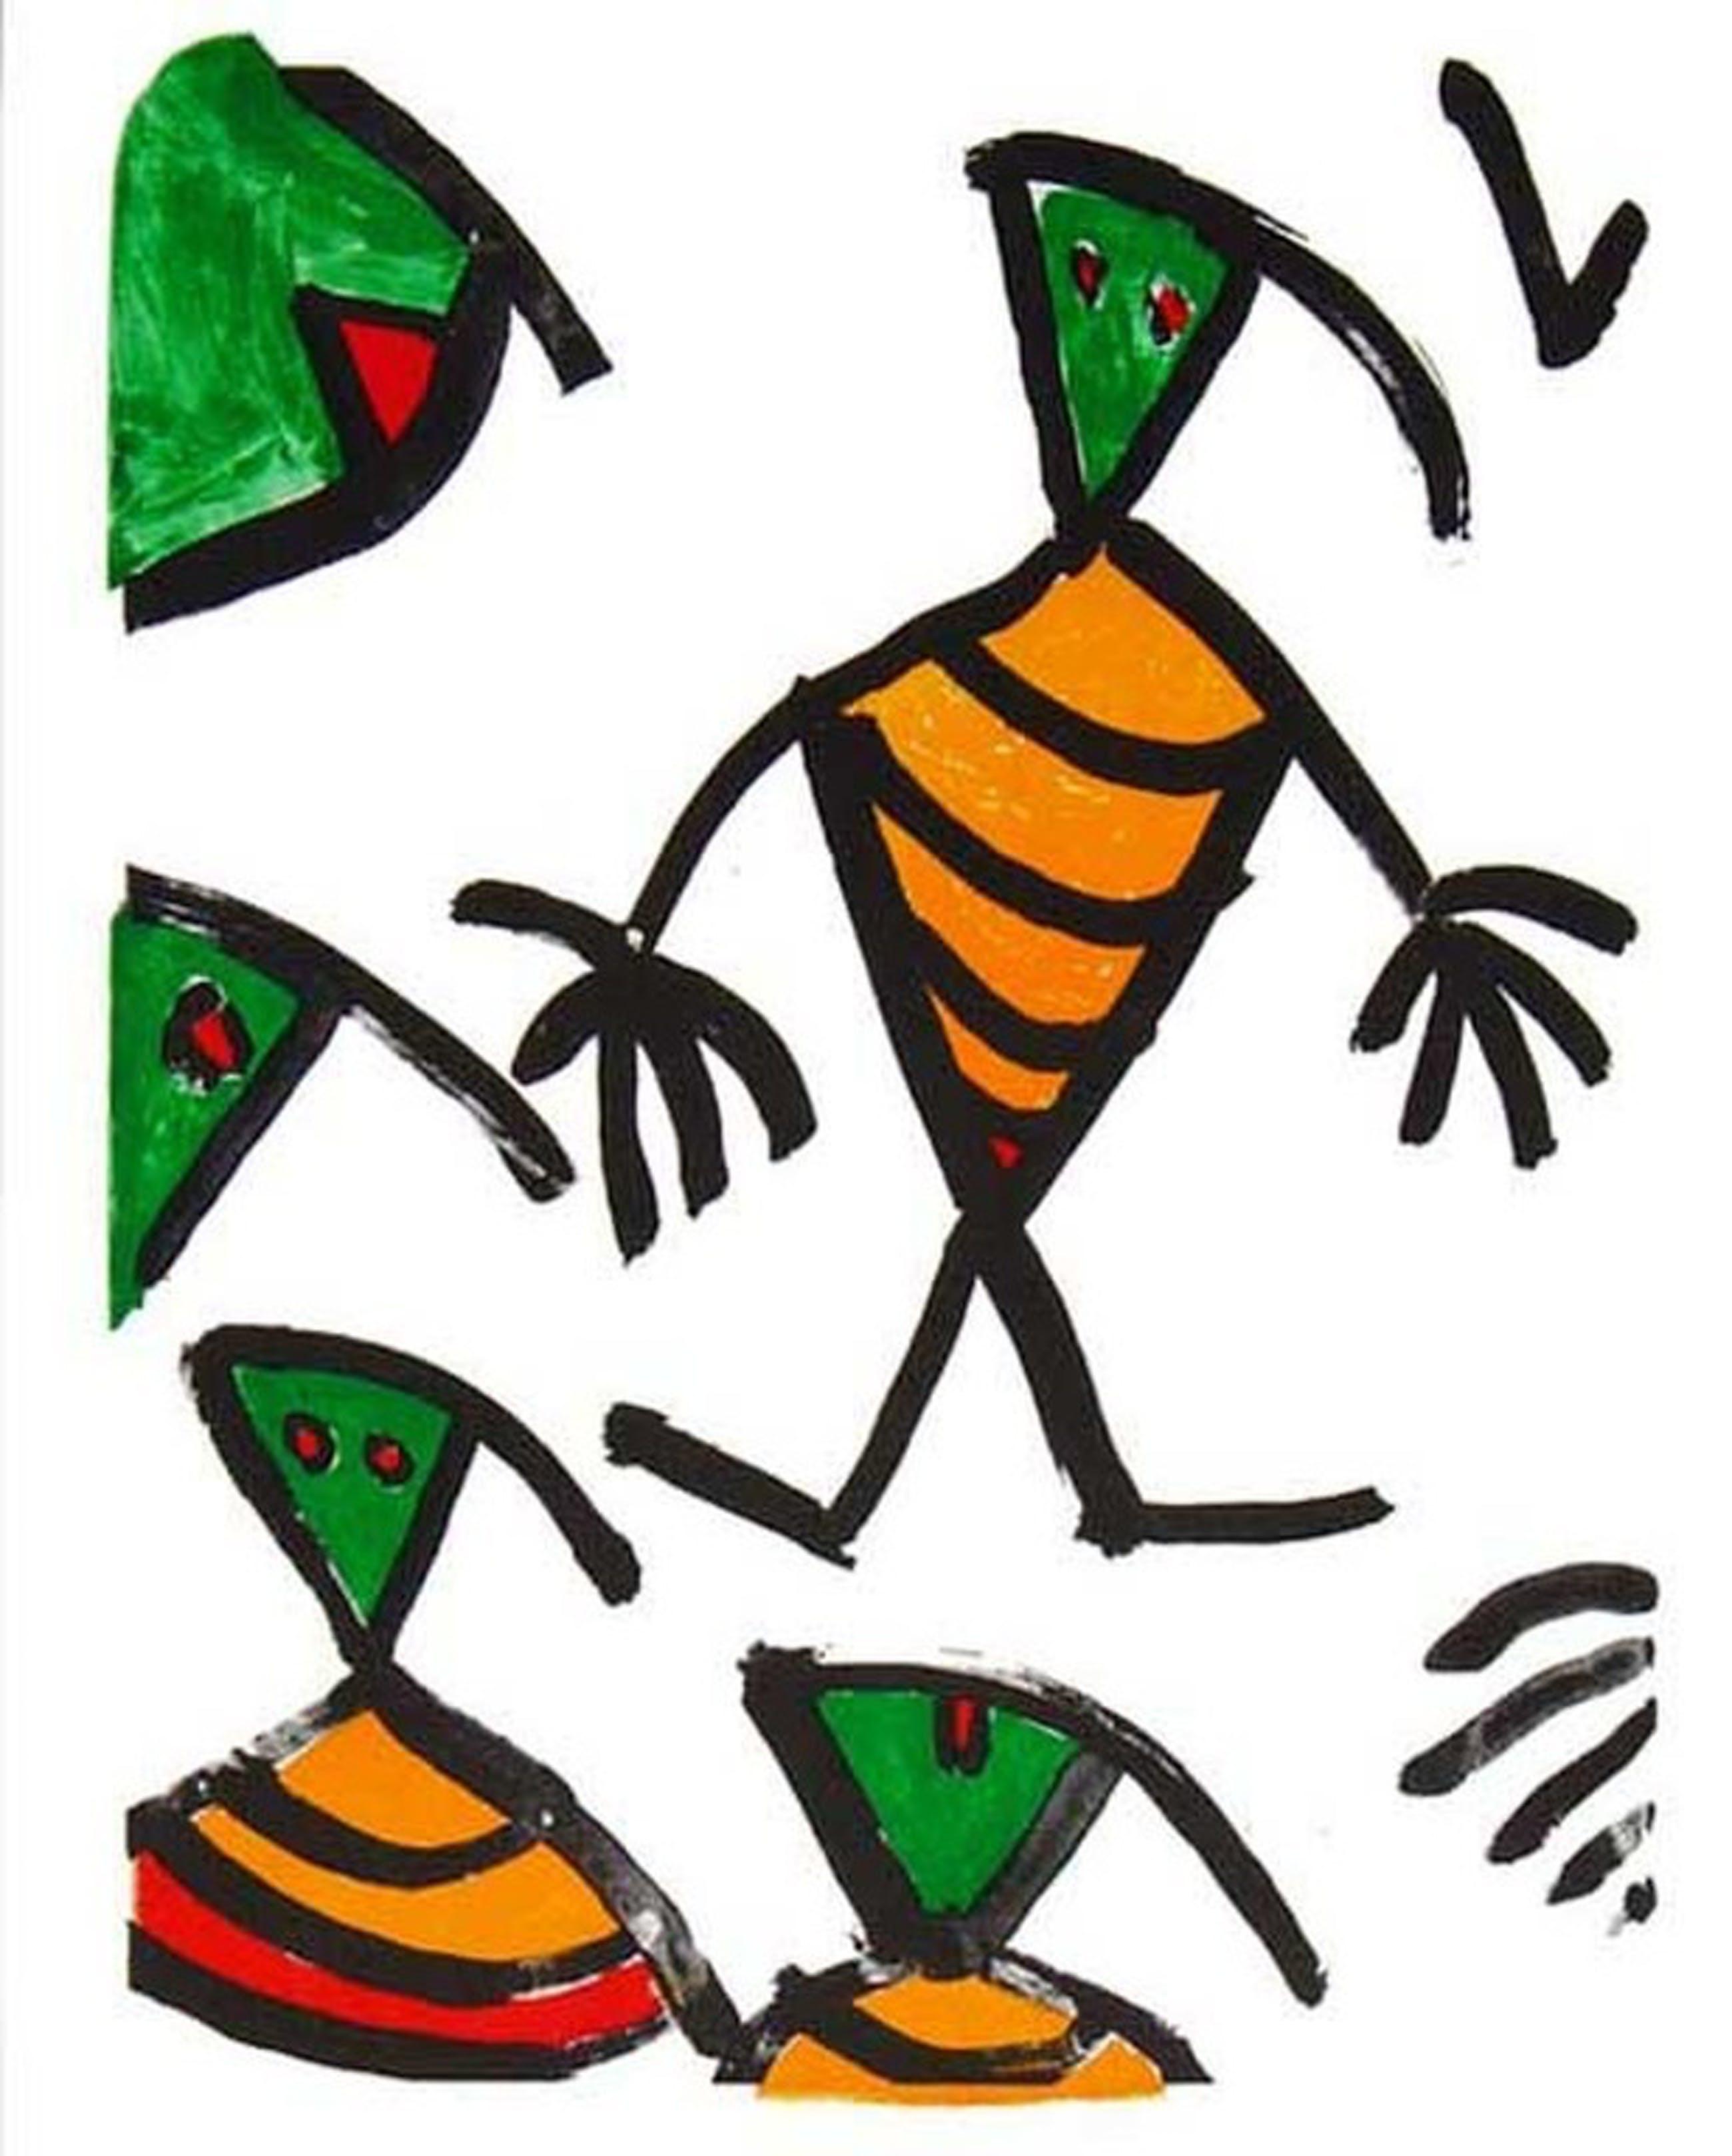 Eugene Ionesco, Affiche Theatervoorstelling, 1982. Voyage chez les morts. kopen? Bied vanaf 15!